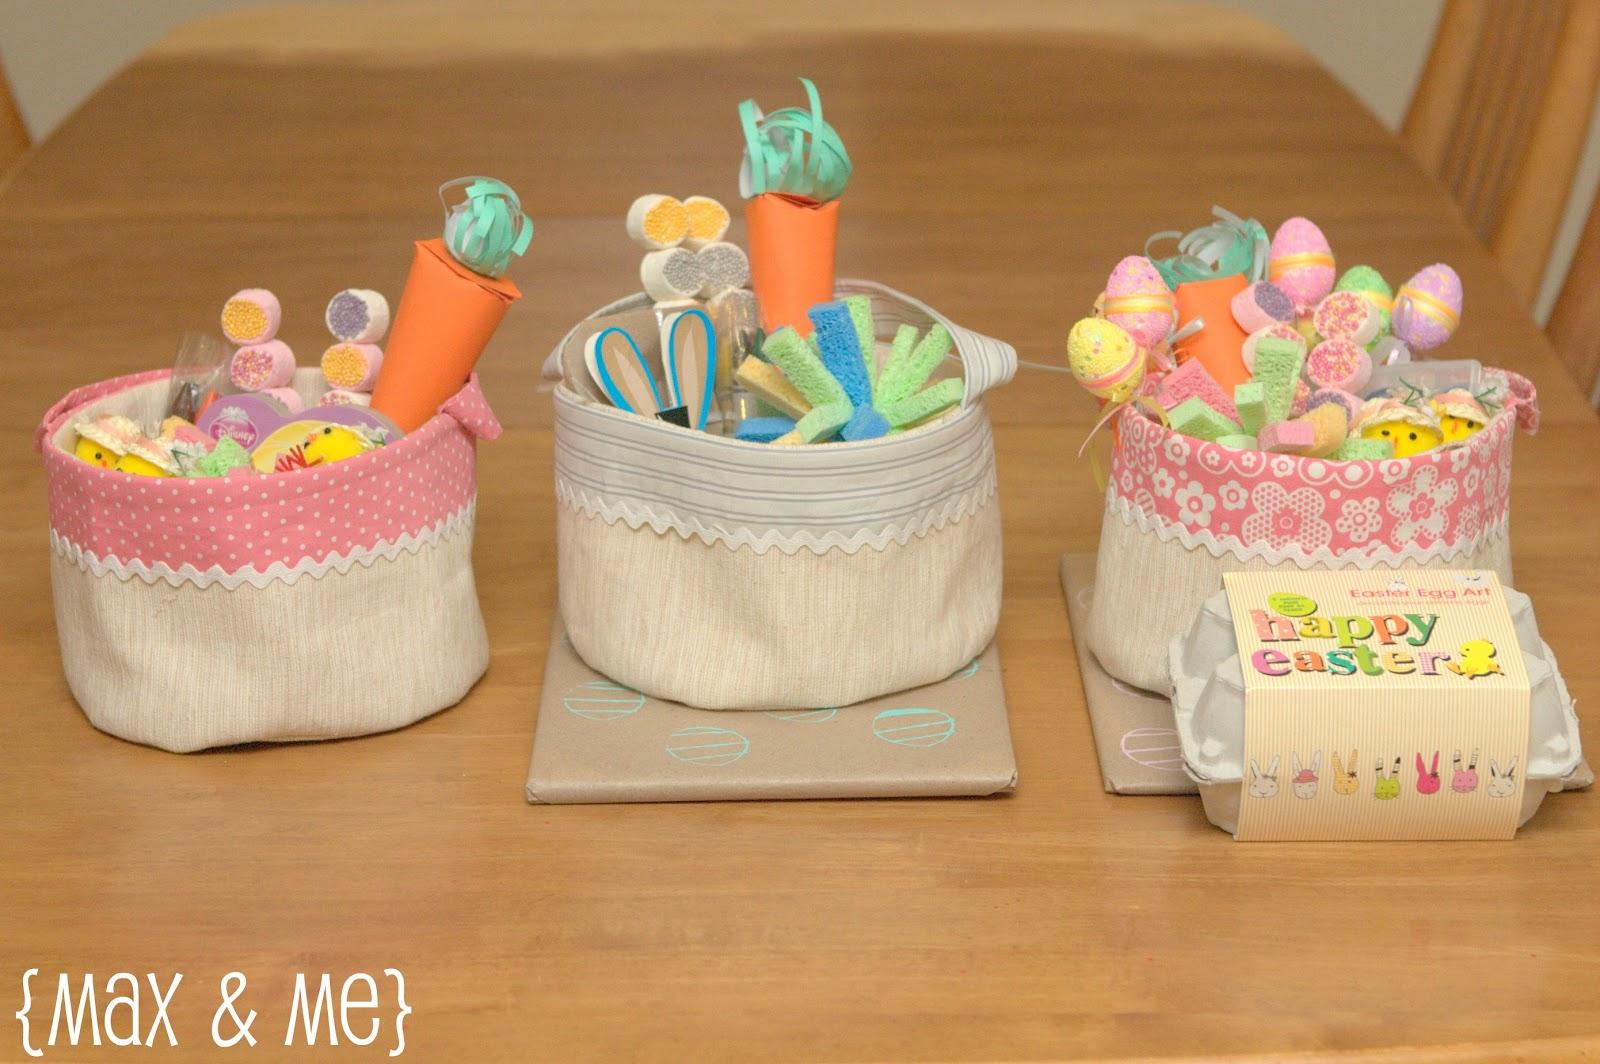 Handmade Easter Baskets Ideas : Max me handmade easter baskets